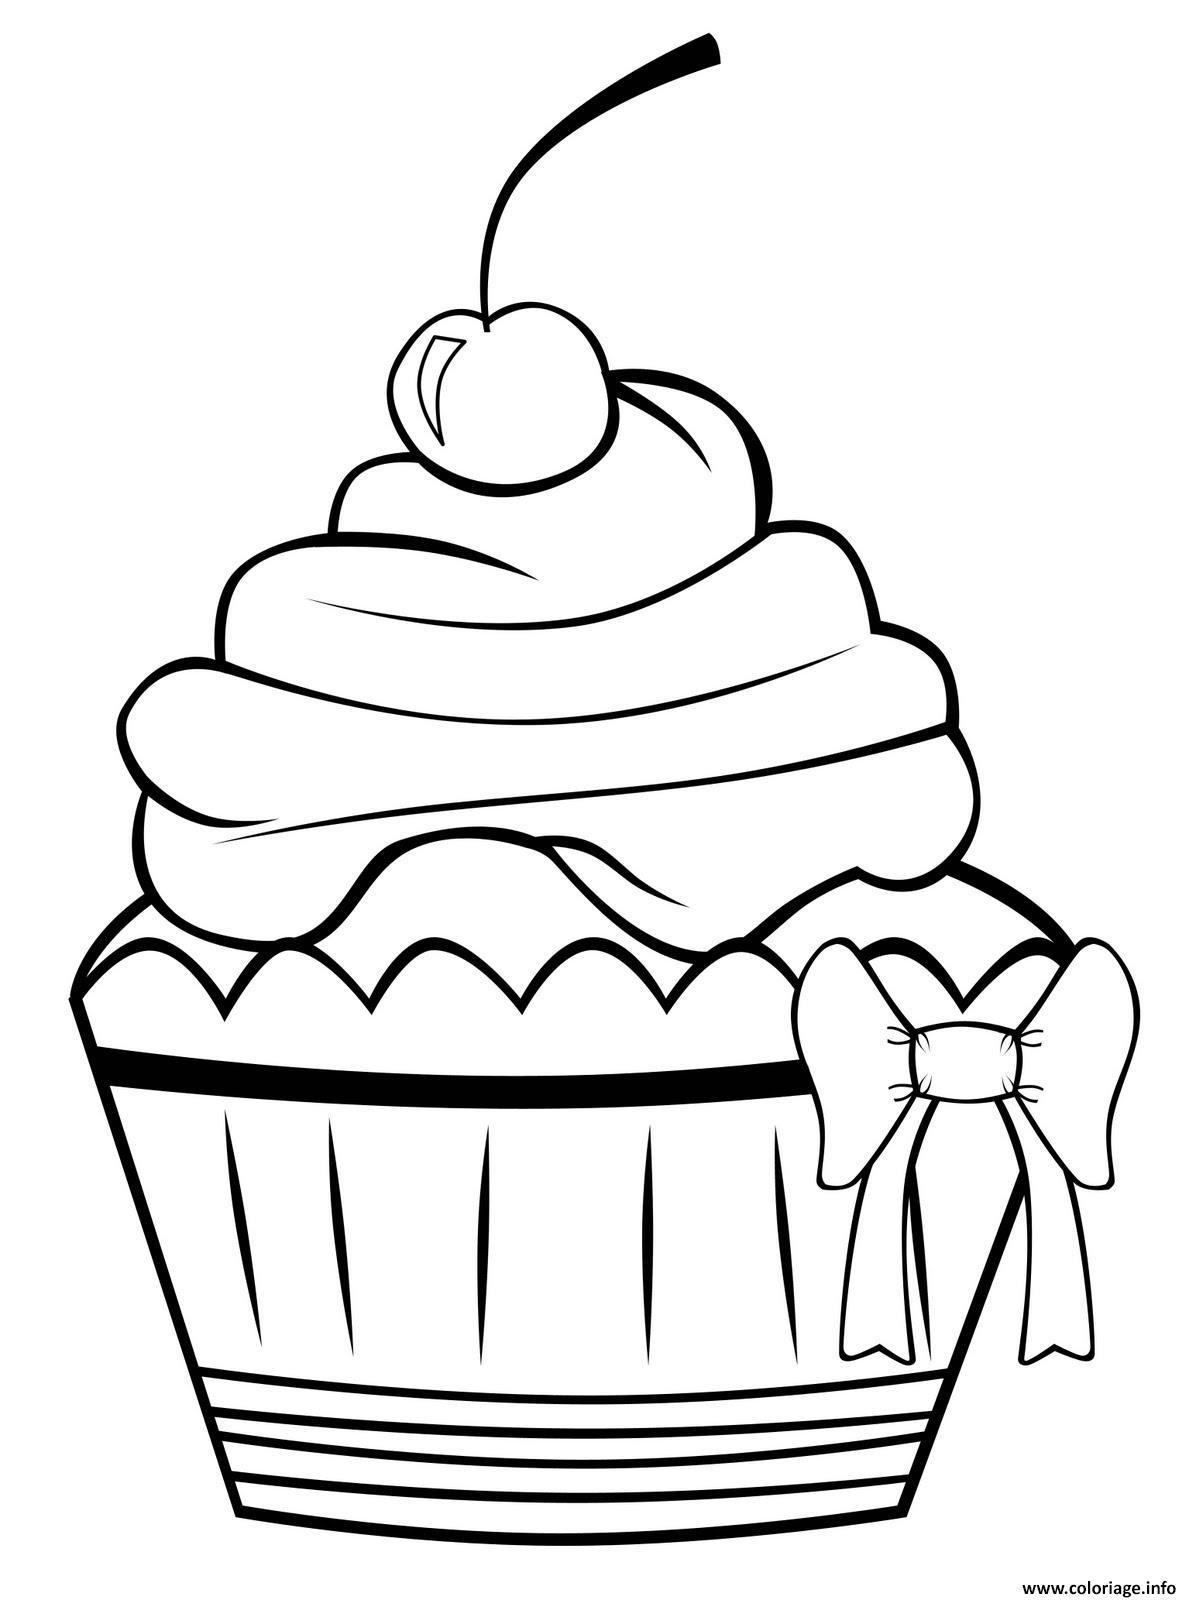 Coloriage cupcake vintage original classic basic4 ...